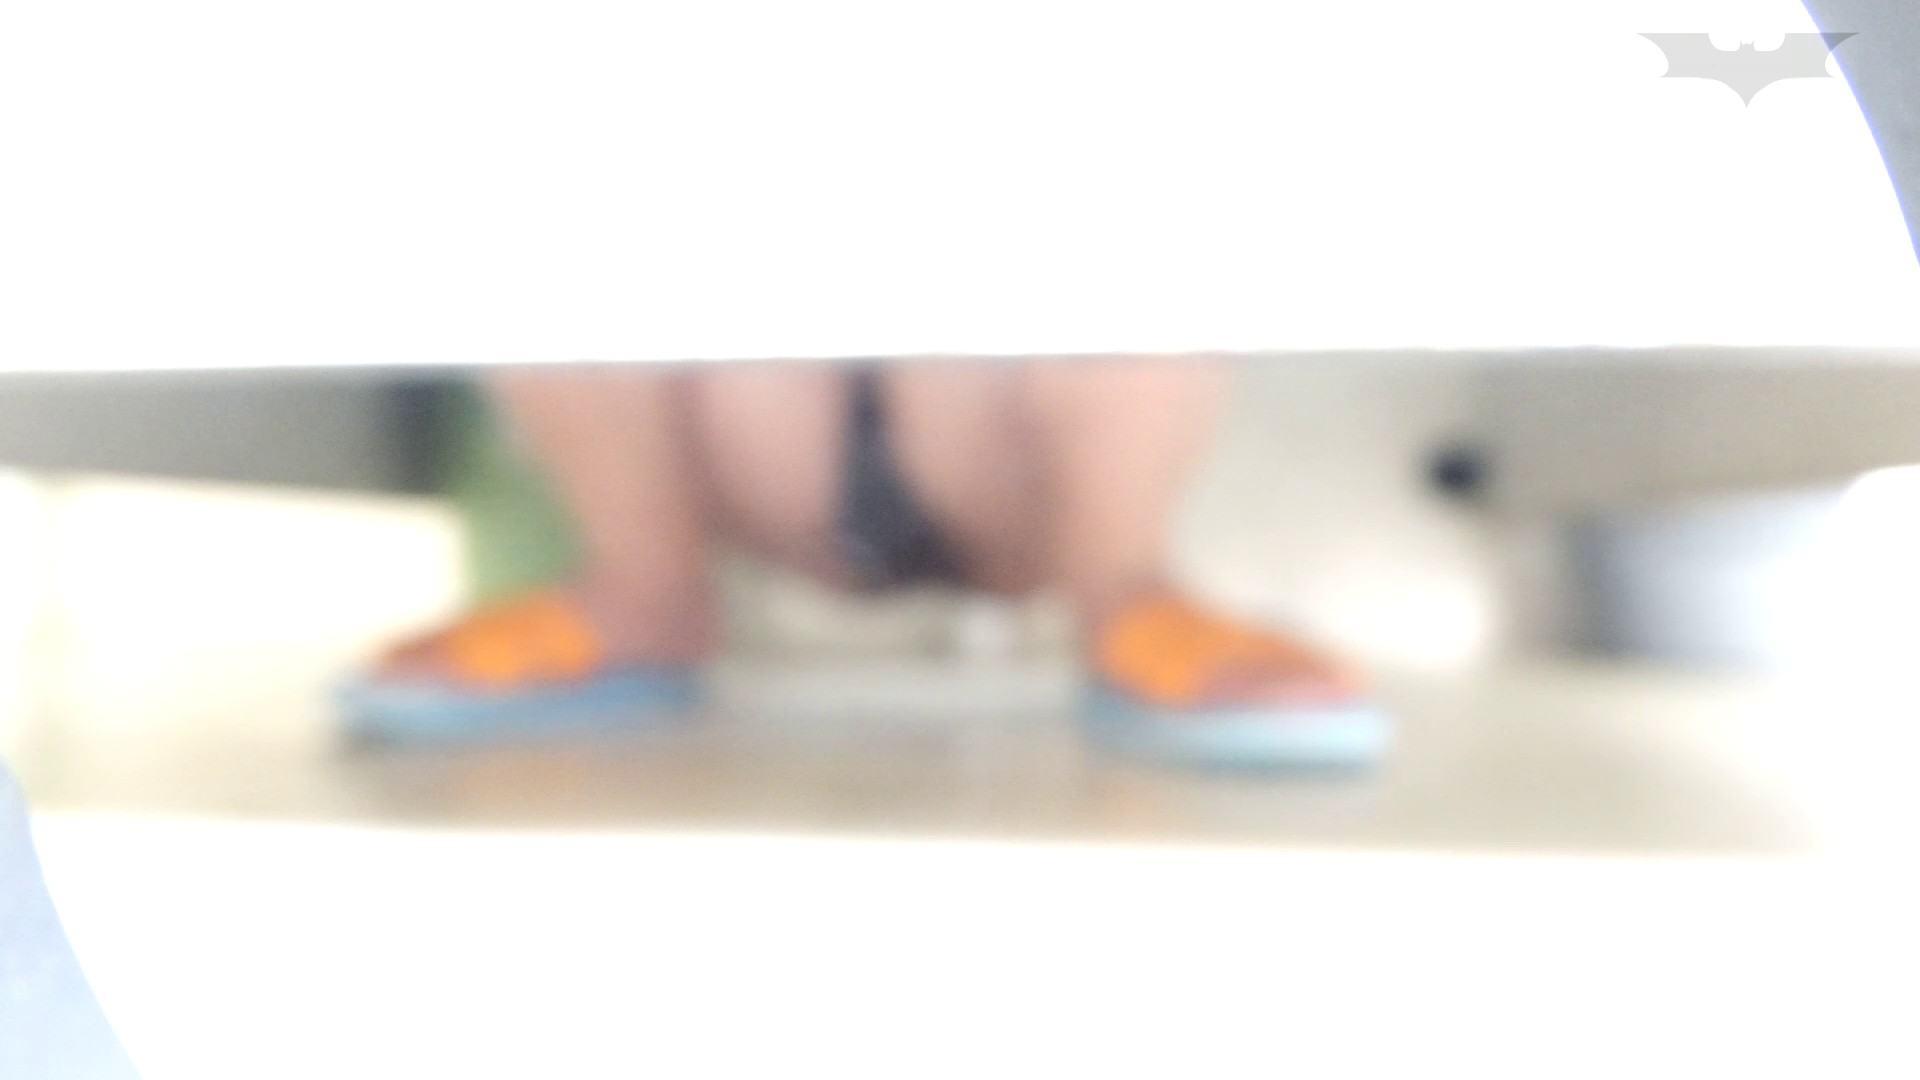 JD盗撮 美女の洗面所の秘密 Vol.67 美肌 ワレメ動画紹介 55画像 15